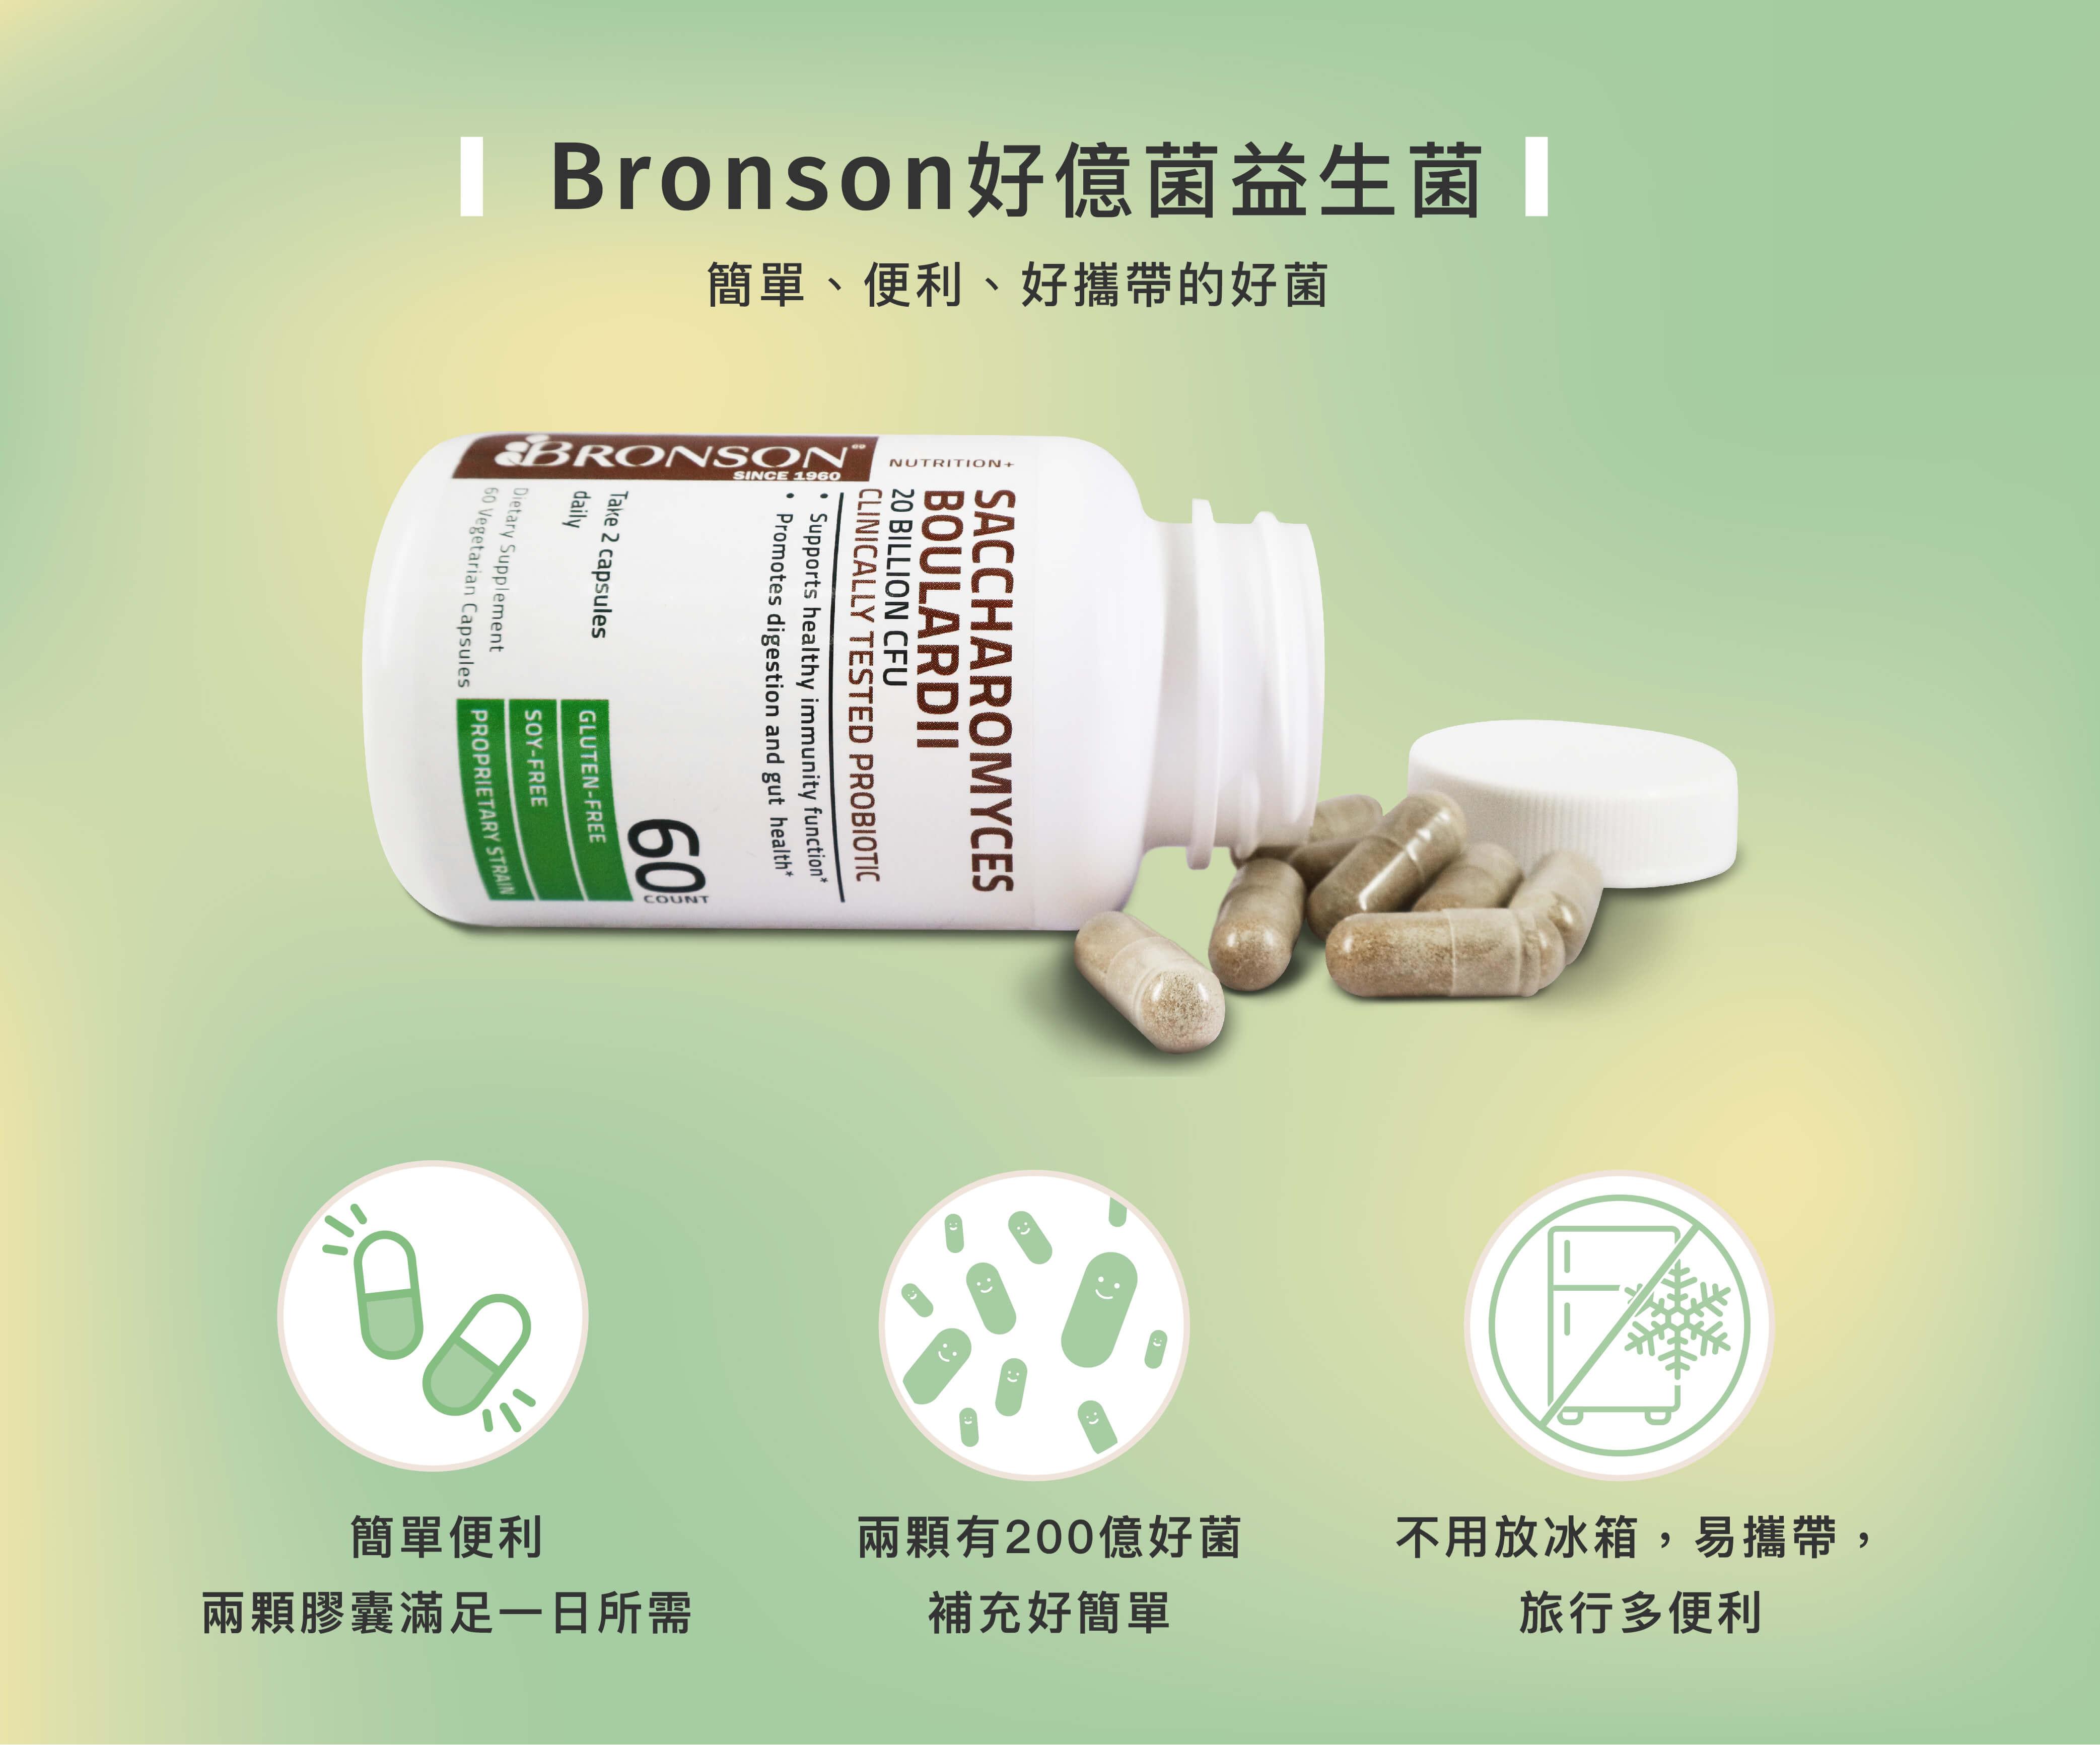 Branson益生菌webpage-06.jpg